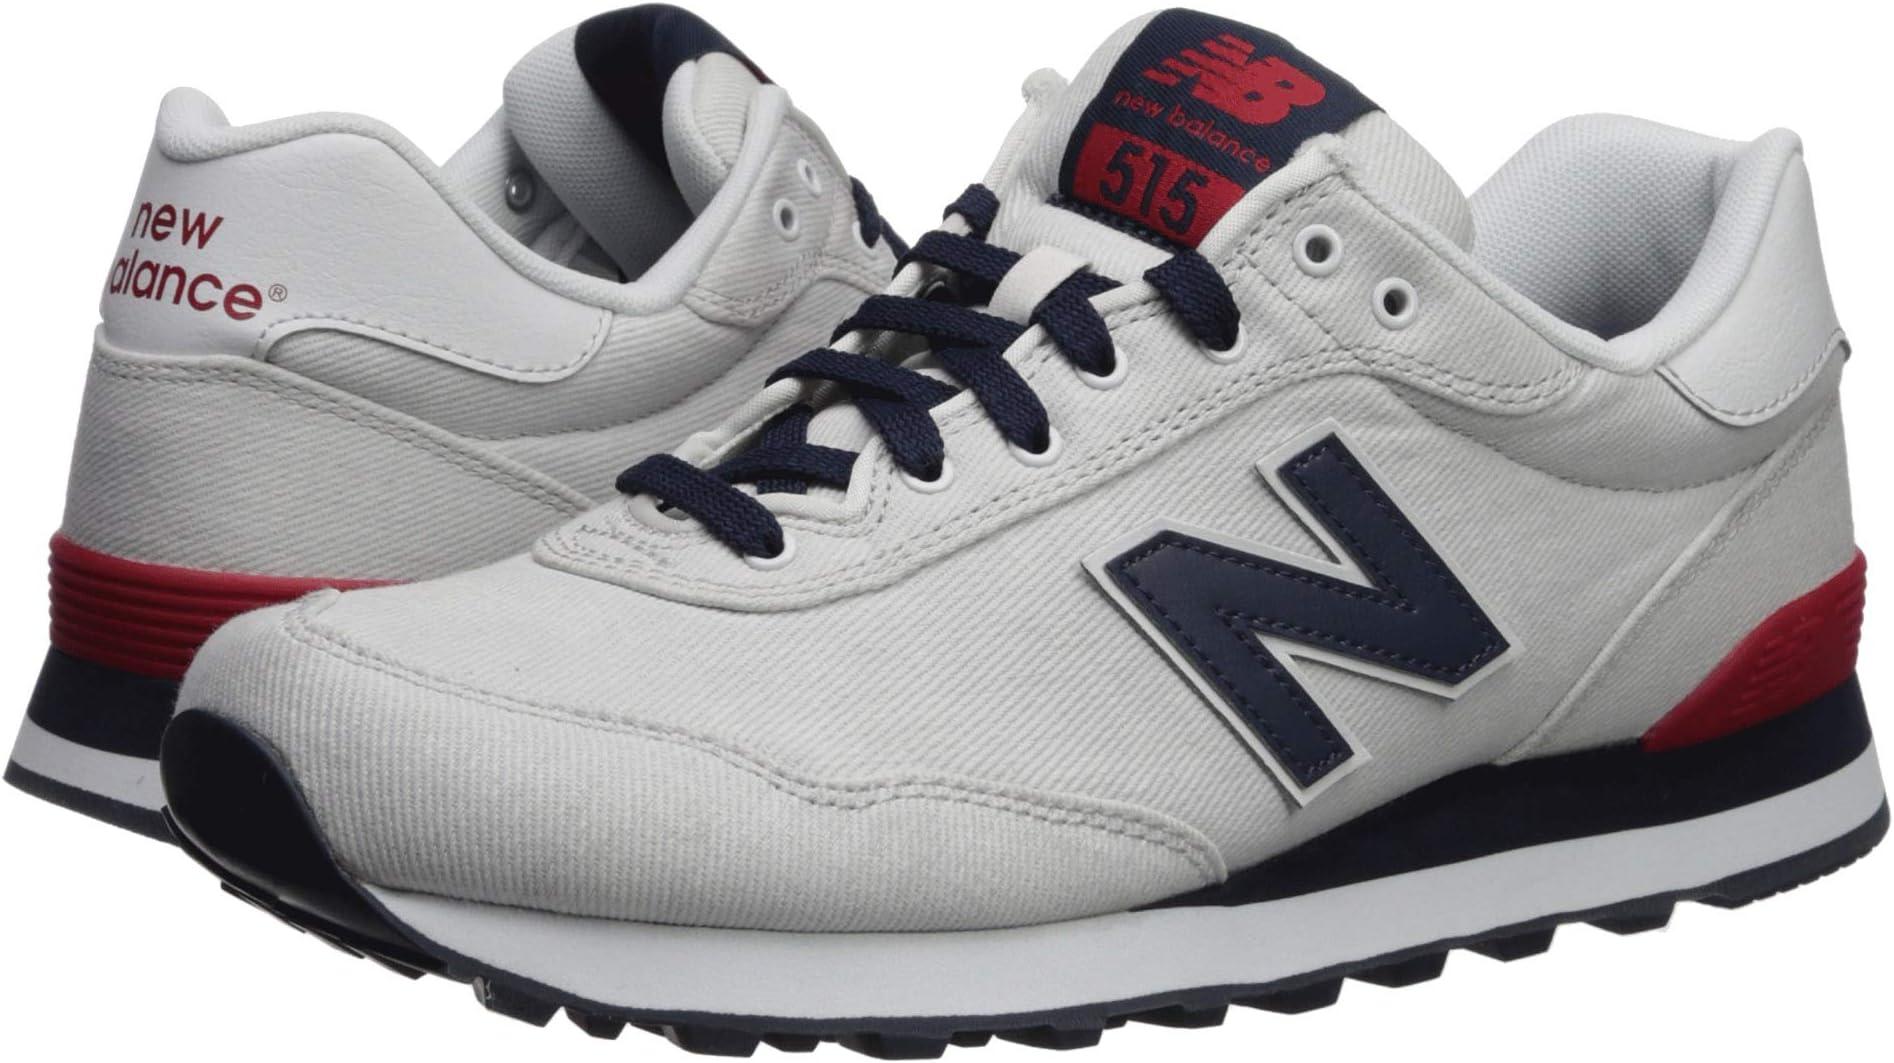 1e5adc316cac2 New Balance Shoes, Clothing, Activewear, Socks | Zappos.com